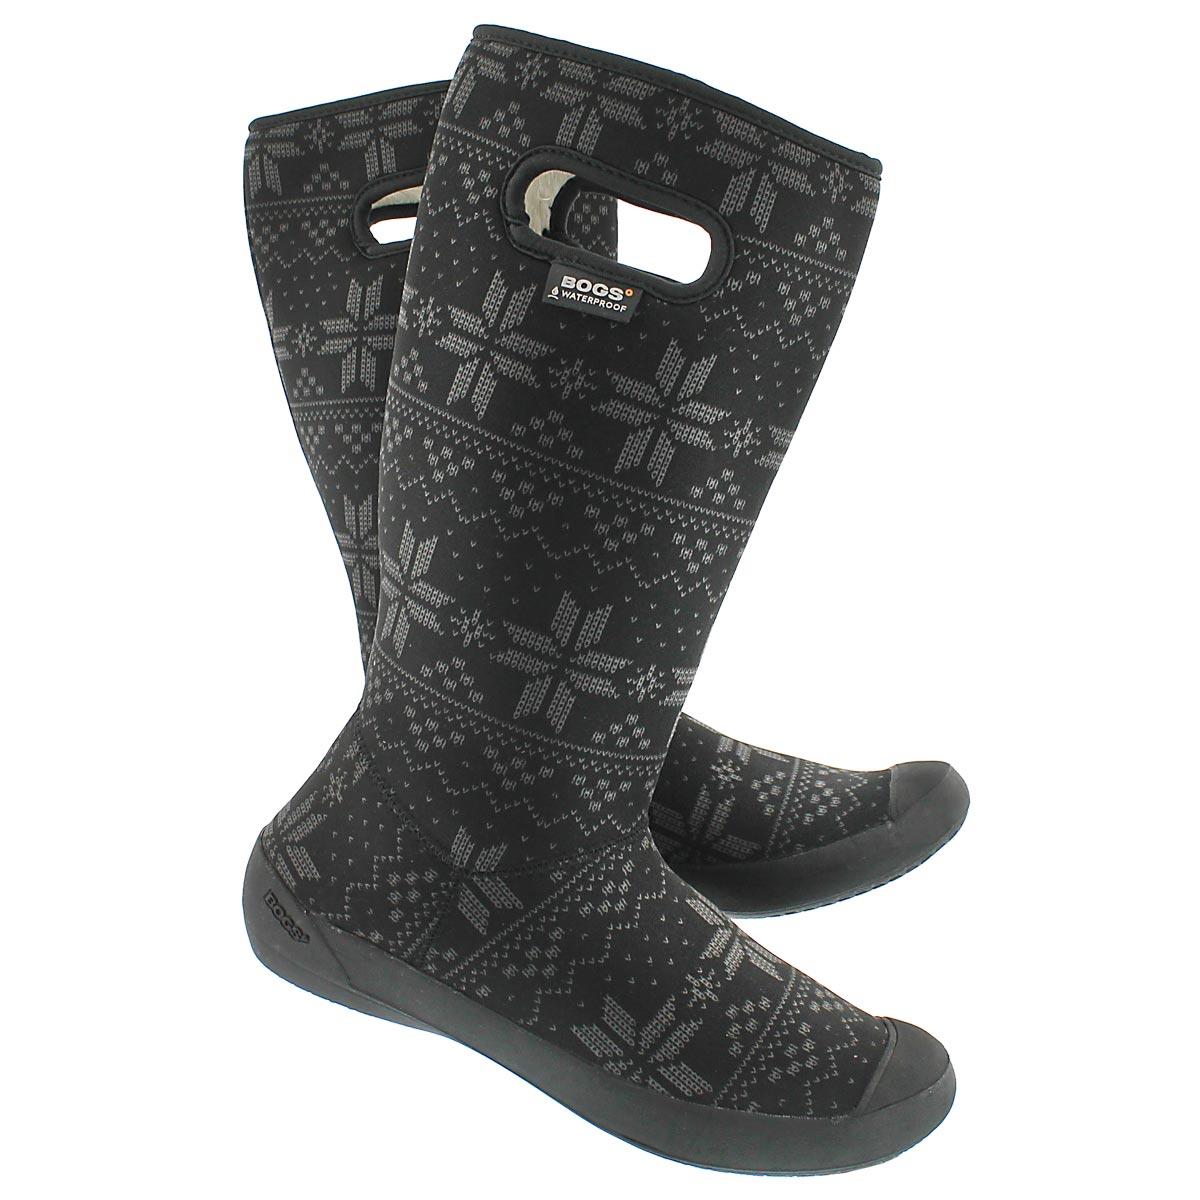 Lds Summit Sweater blk wtpf winter boot